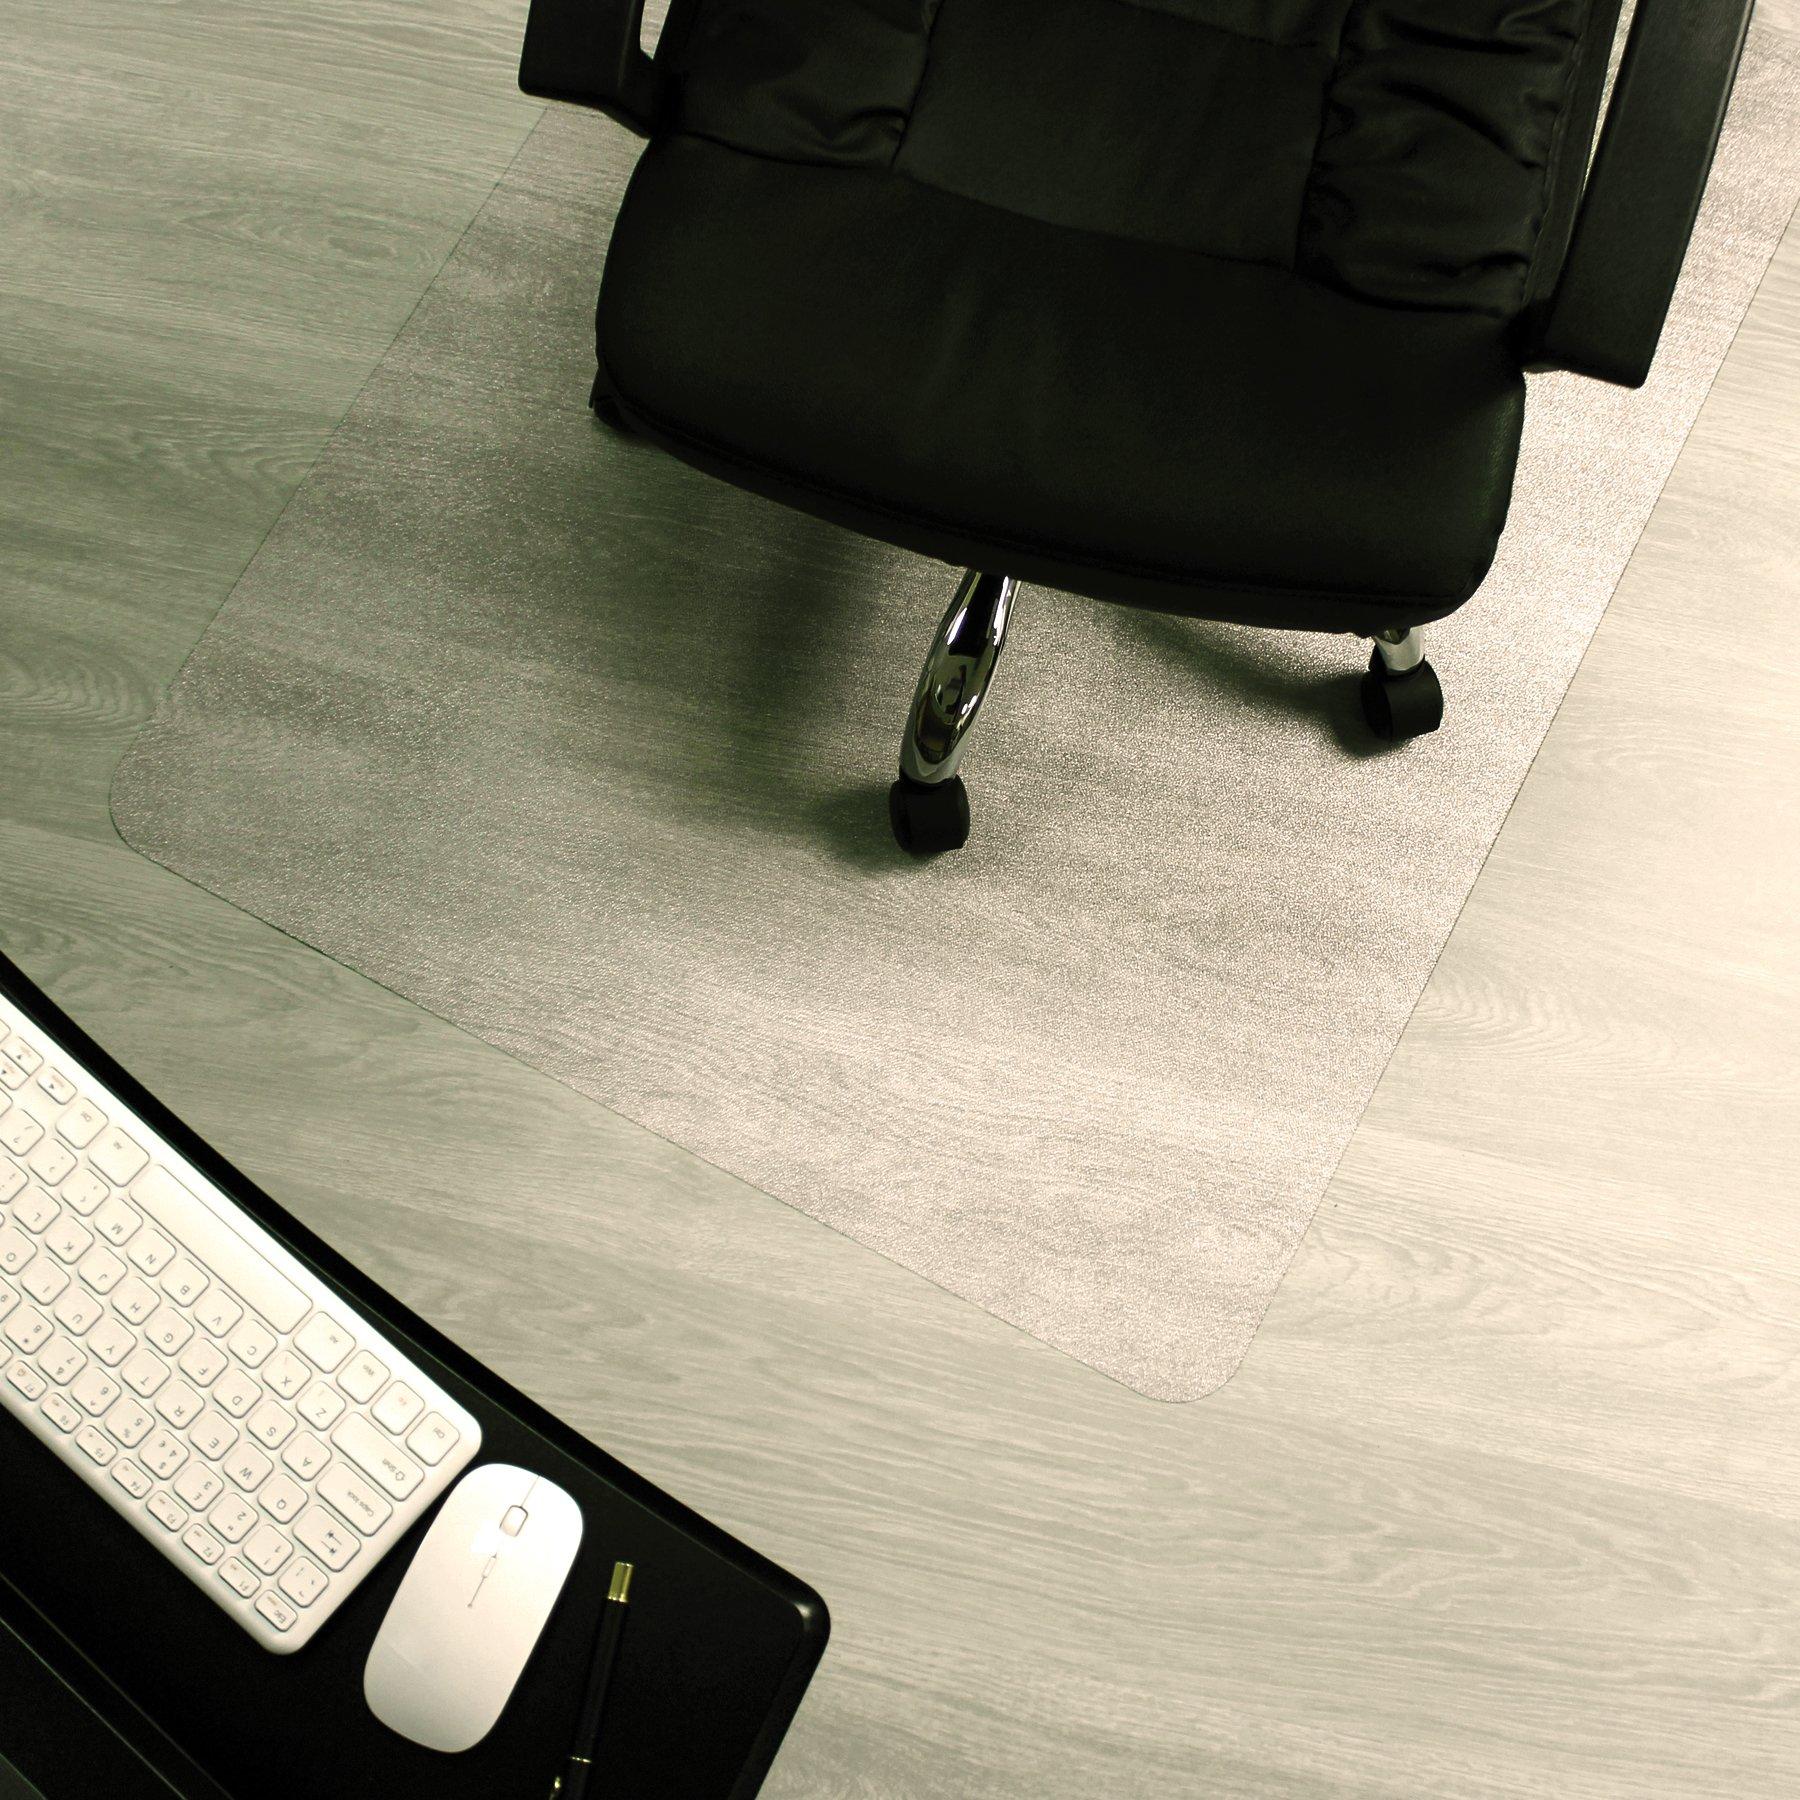 Marvelux 48'' x 60'' ECO (Enhanced Polymer) Rectangular Chair Mat for Hard Floors | Transparent Hardwood Floor Protector | Multiple Sizes